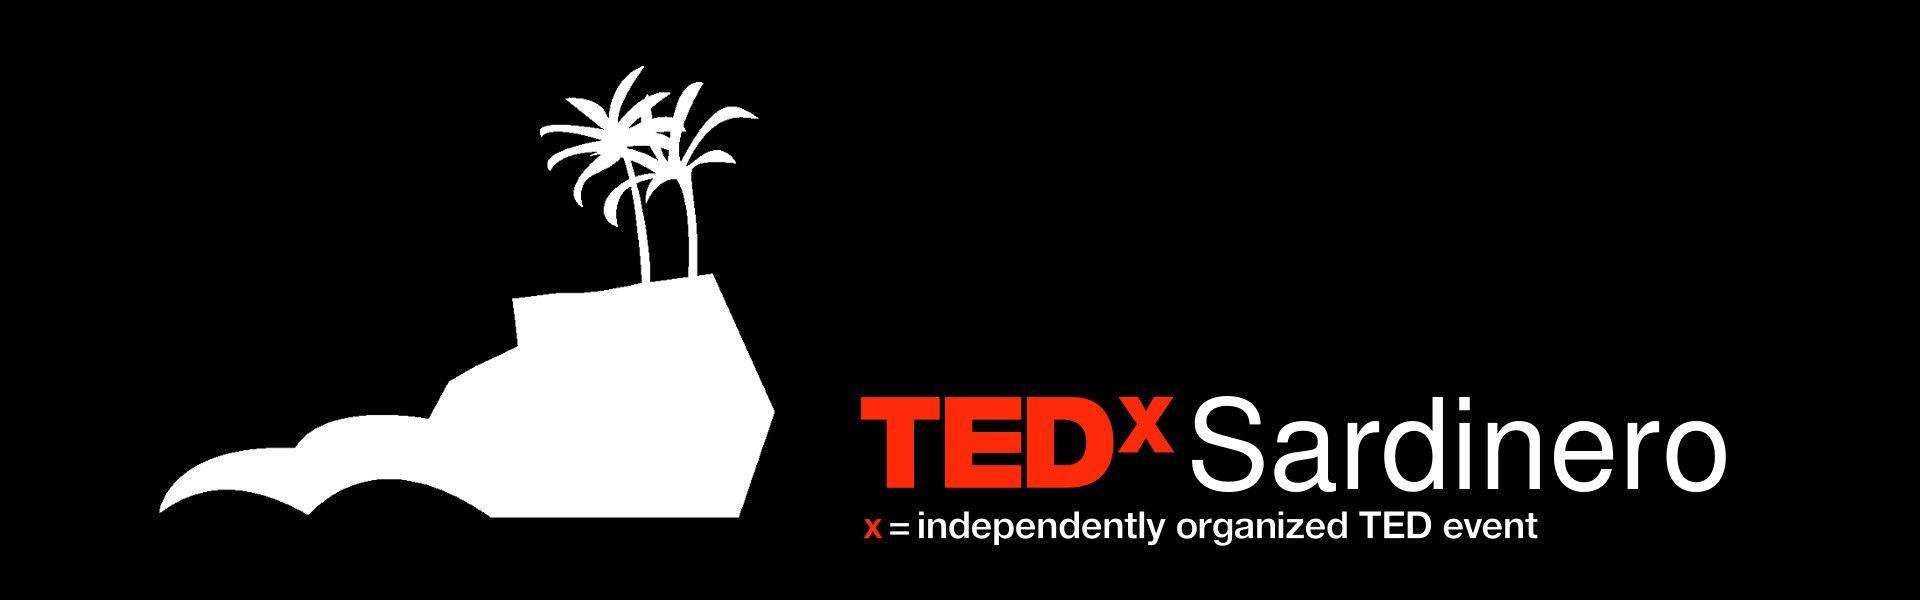 TedxSardinero